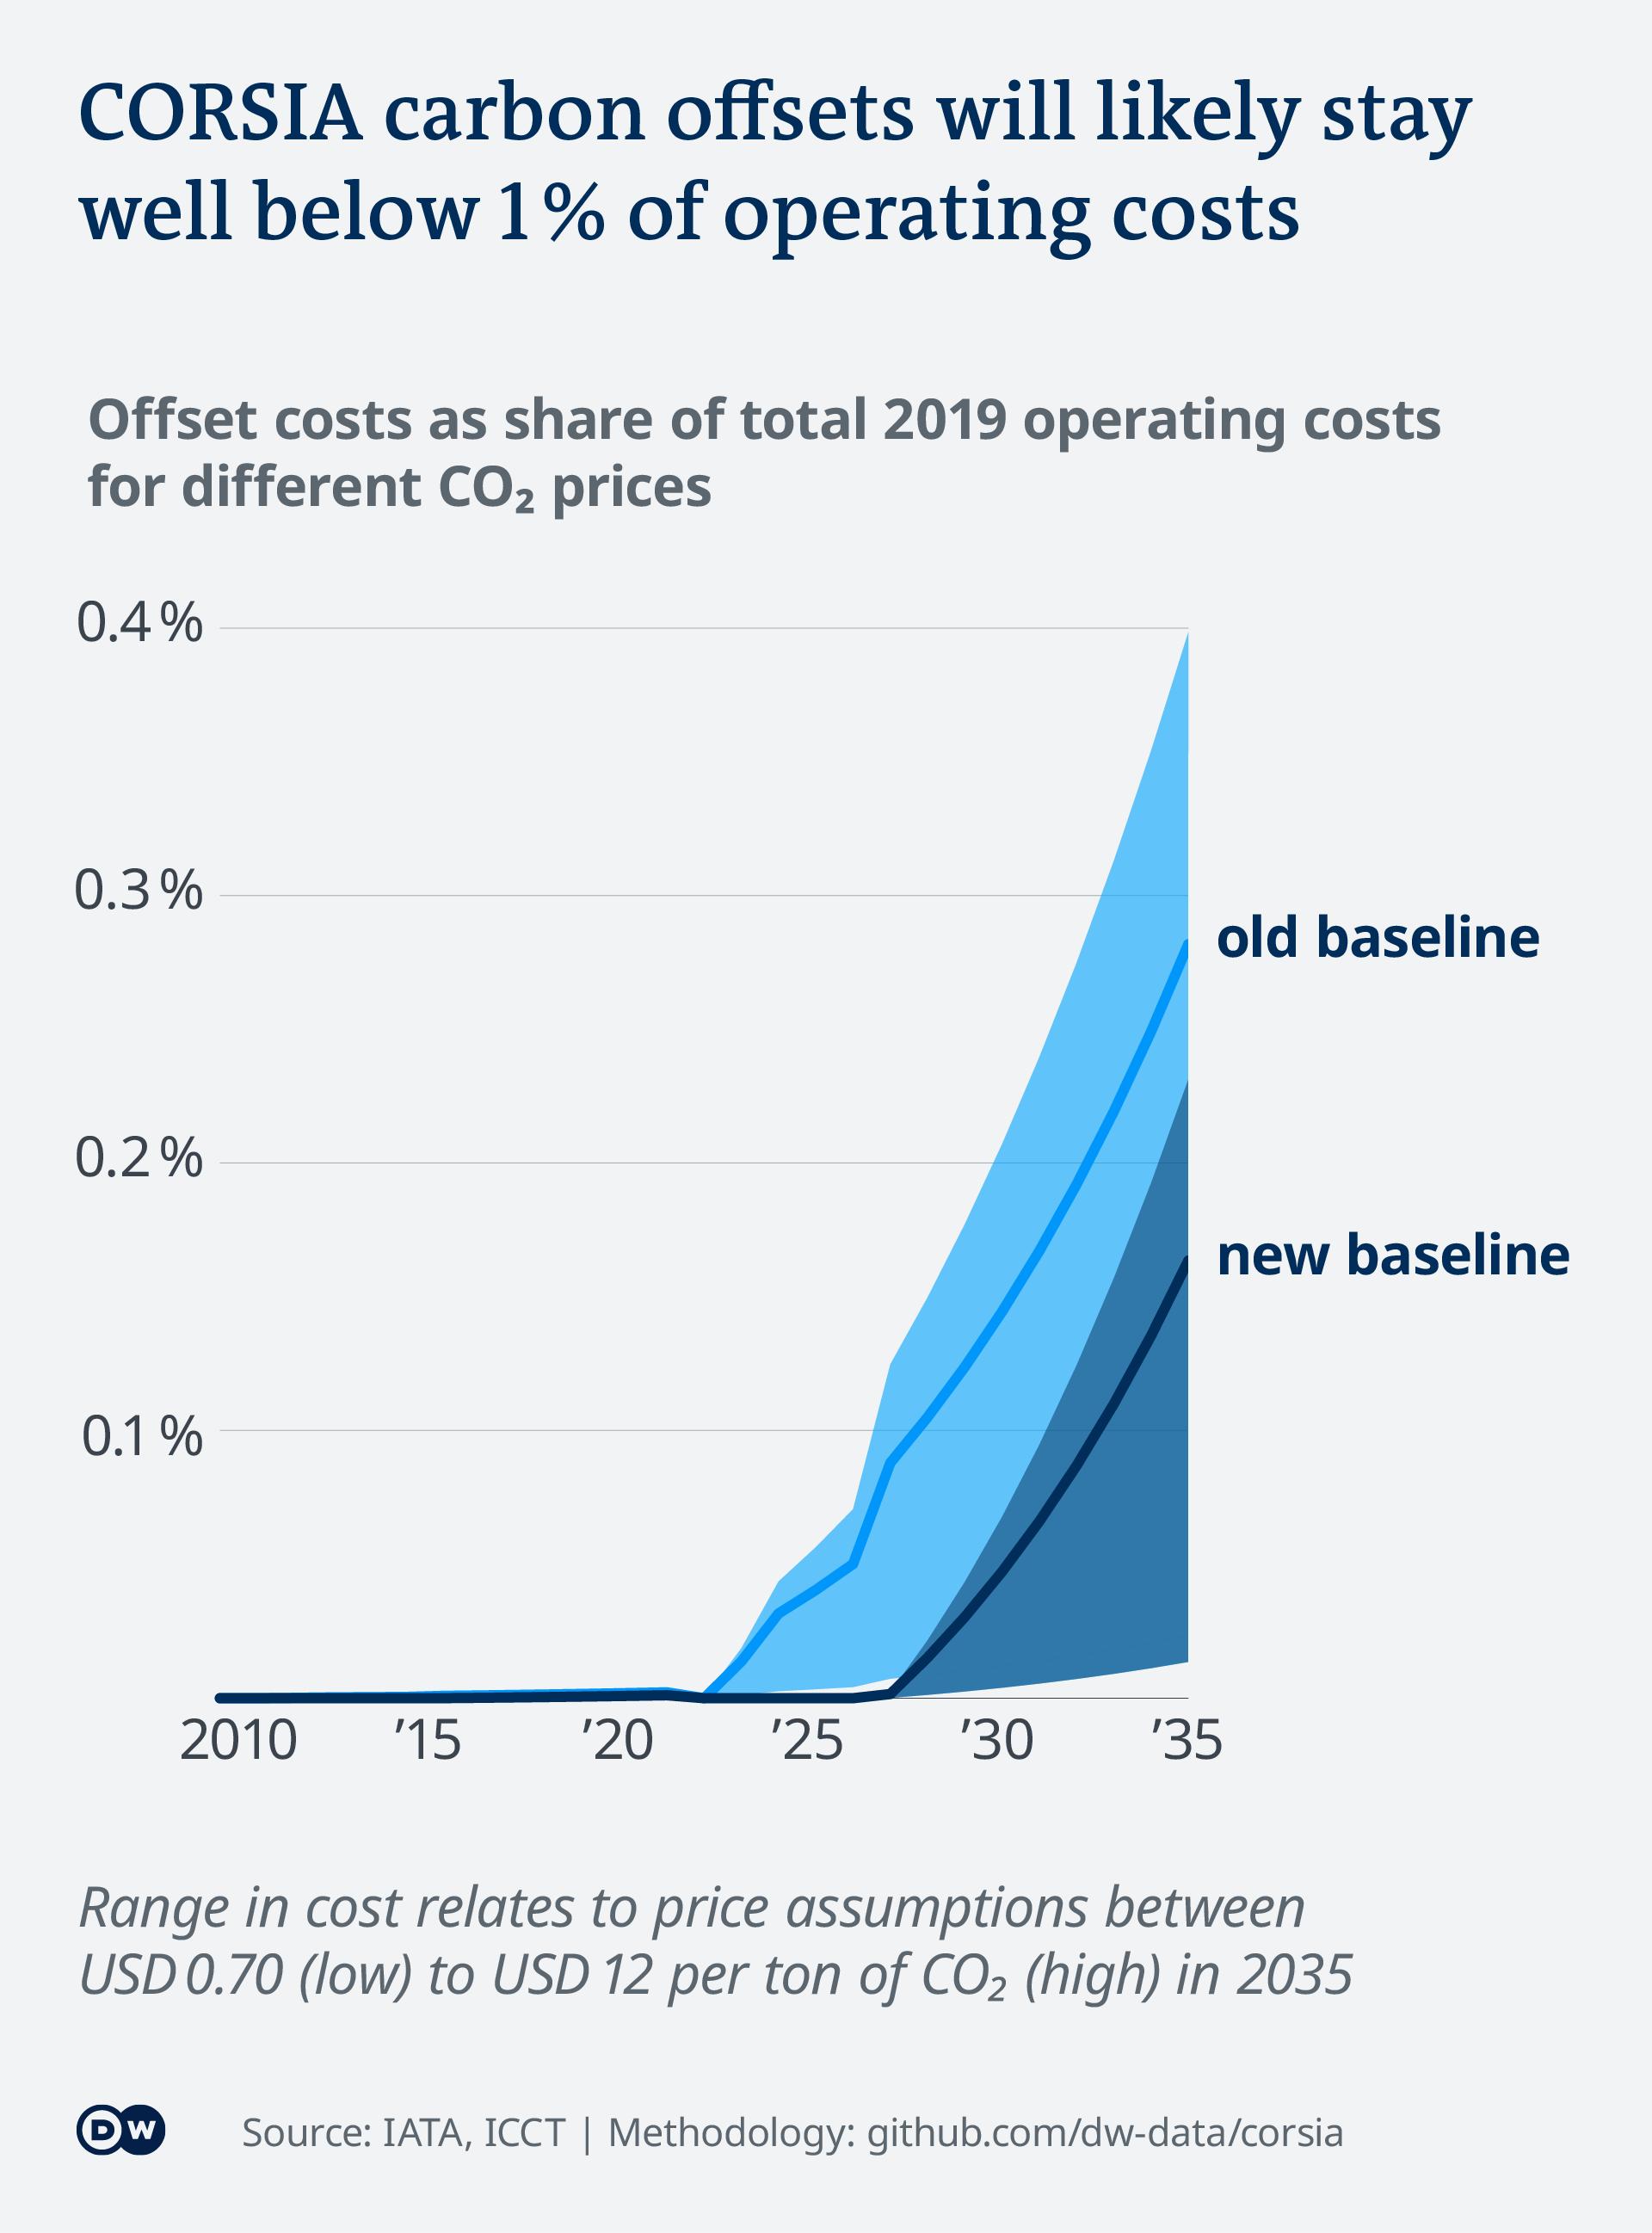 Data visualization EN corsia aviation co2 emissions offset costs